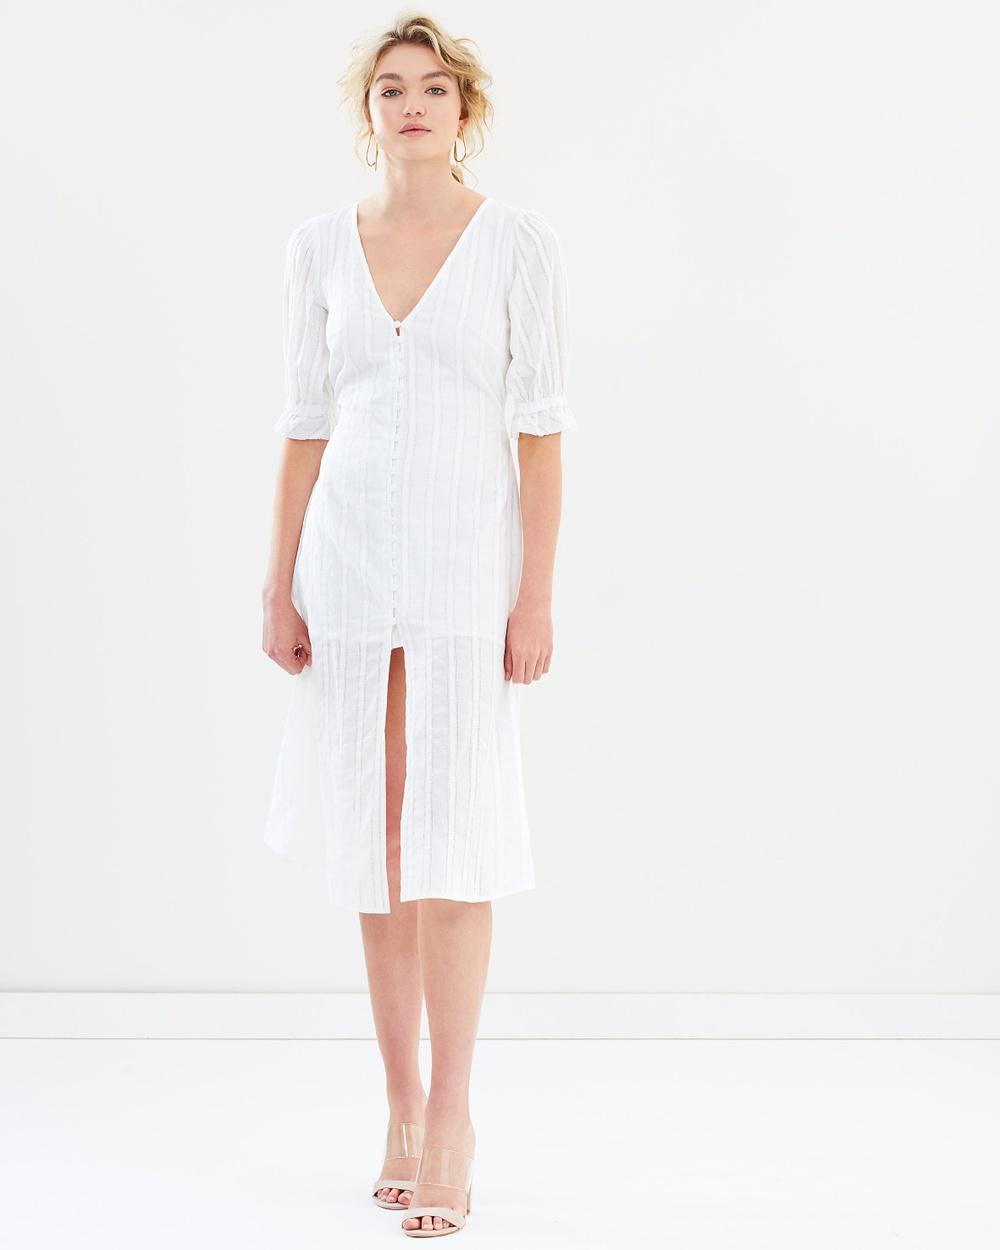 Bec & Bridge Joie Midi Dress Dresses Ivory Joie Midi Dress